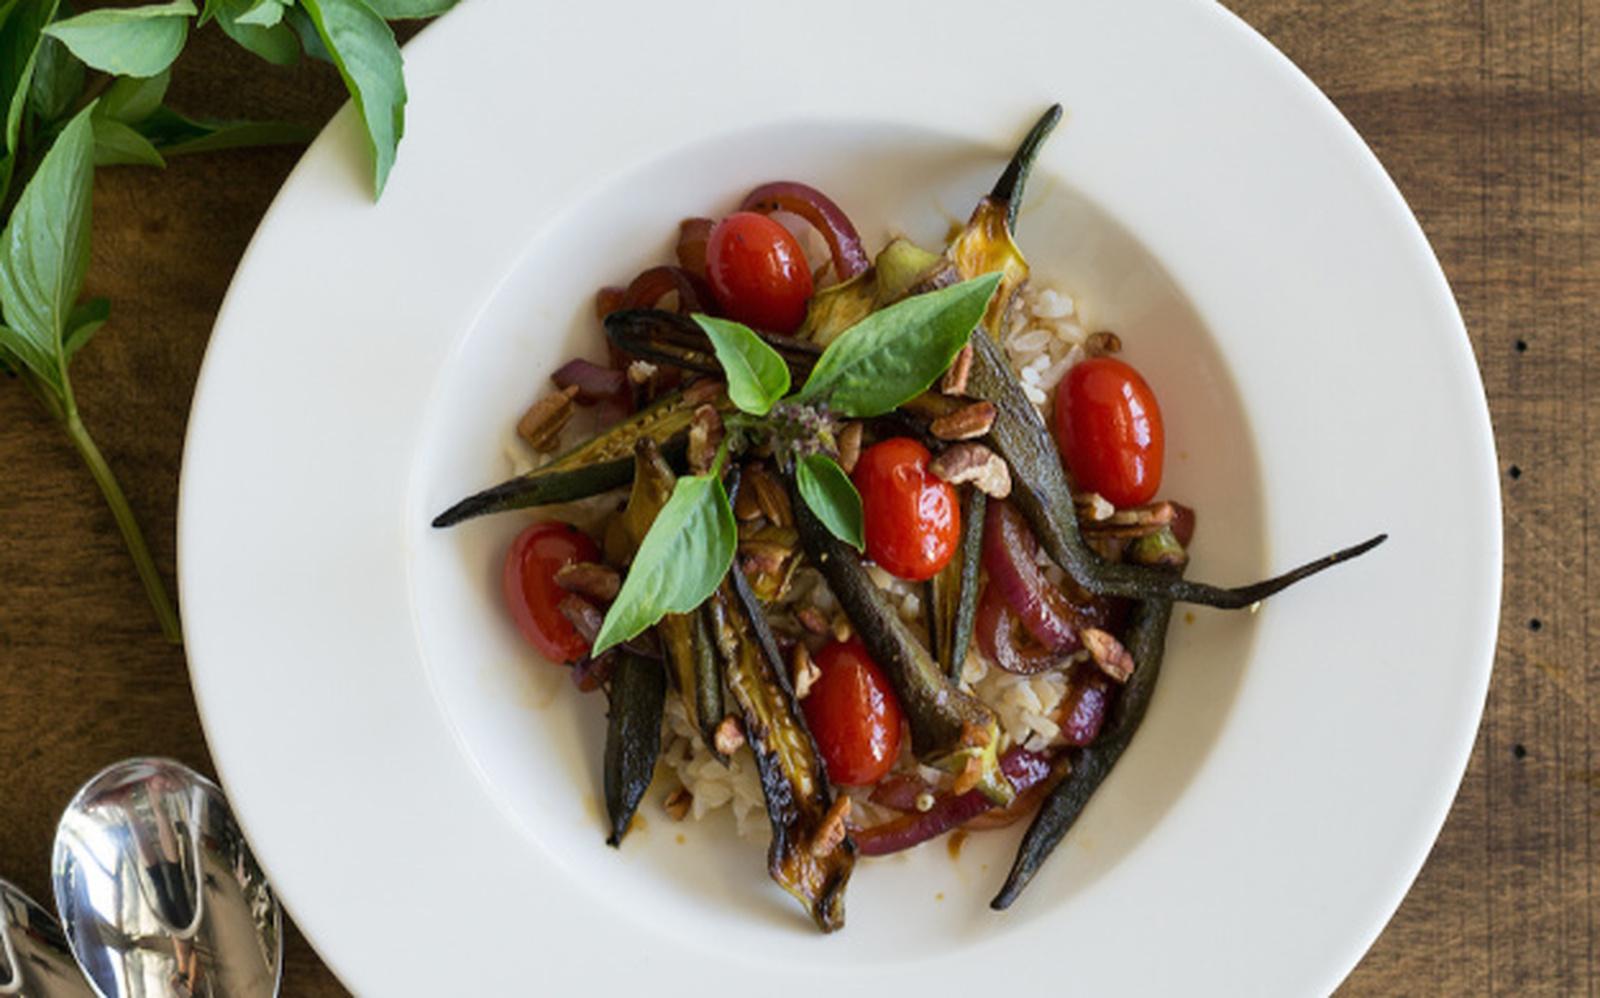 Southern Okra, Pecan, and Cherry Tomato Stir-Fry [Vegan, Gluten-Free]